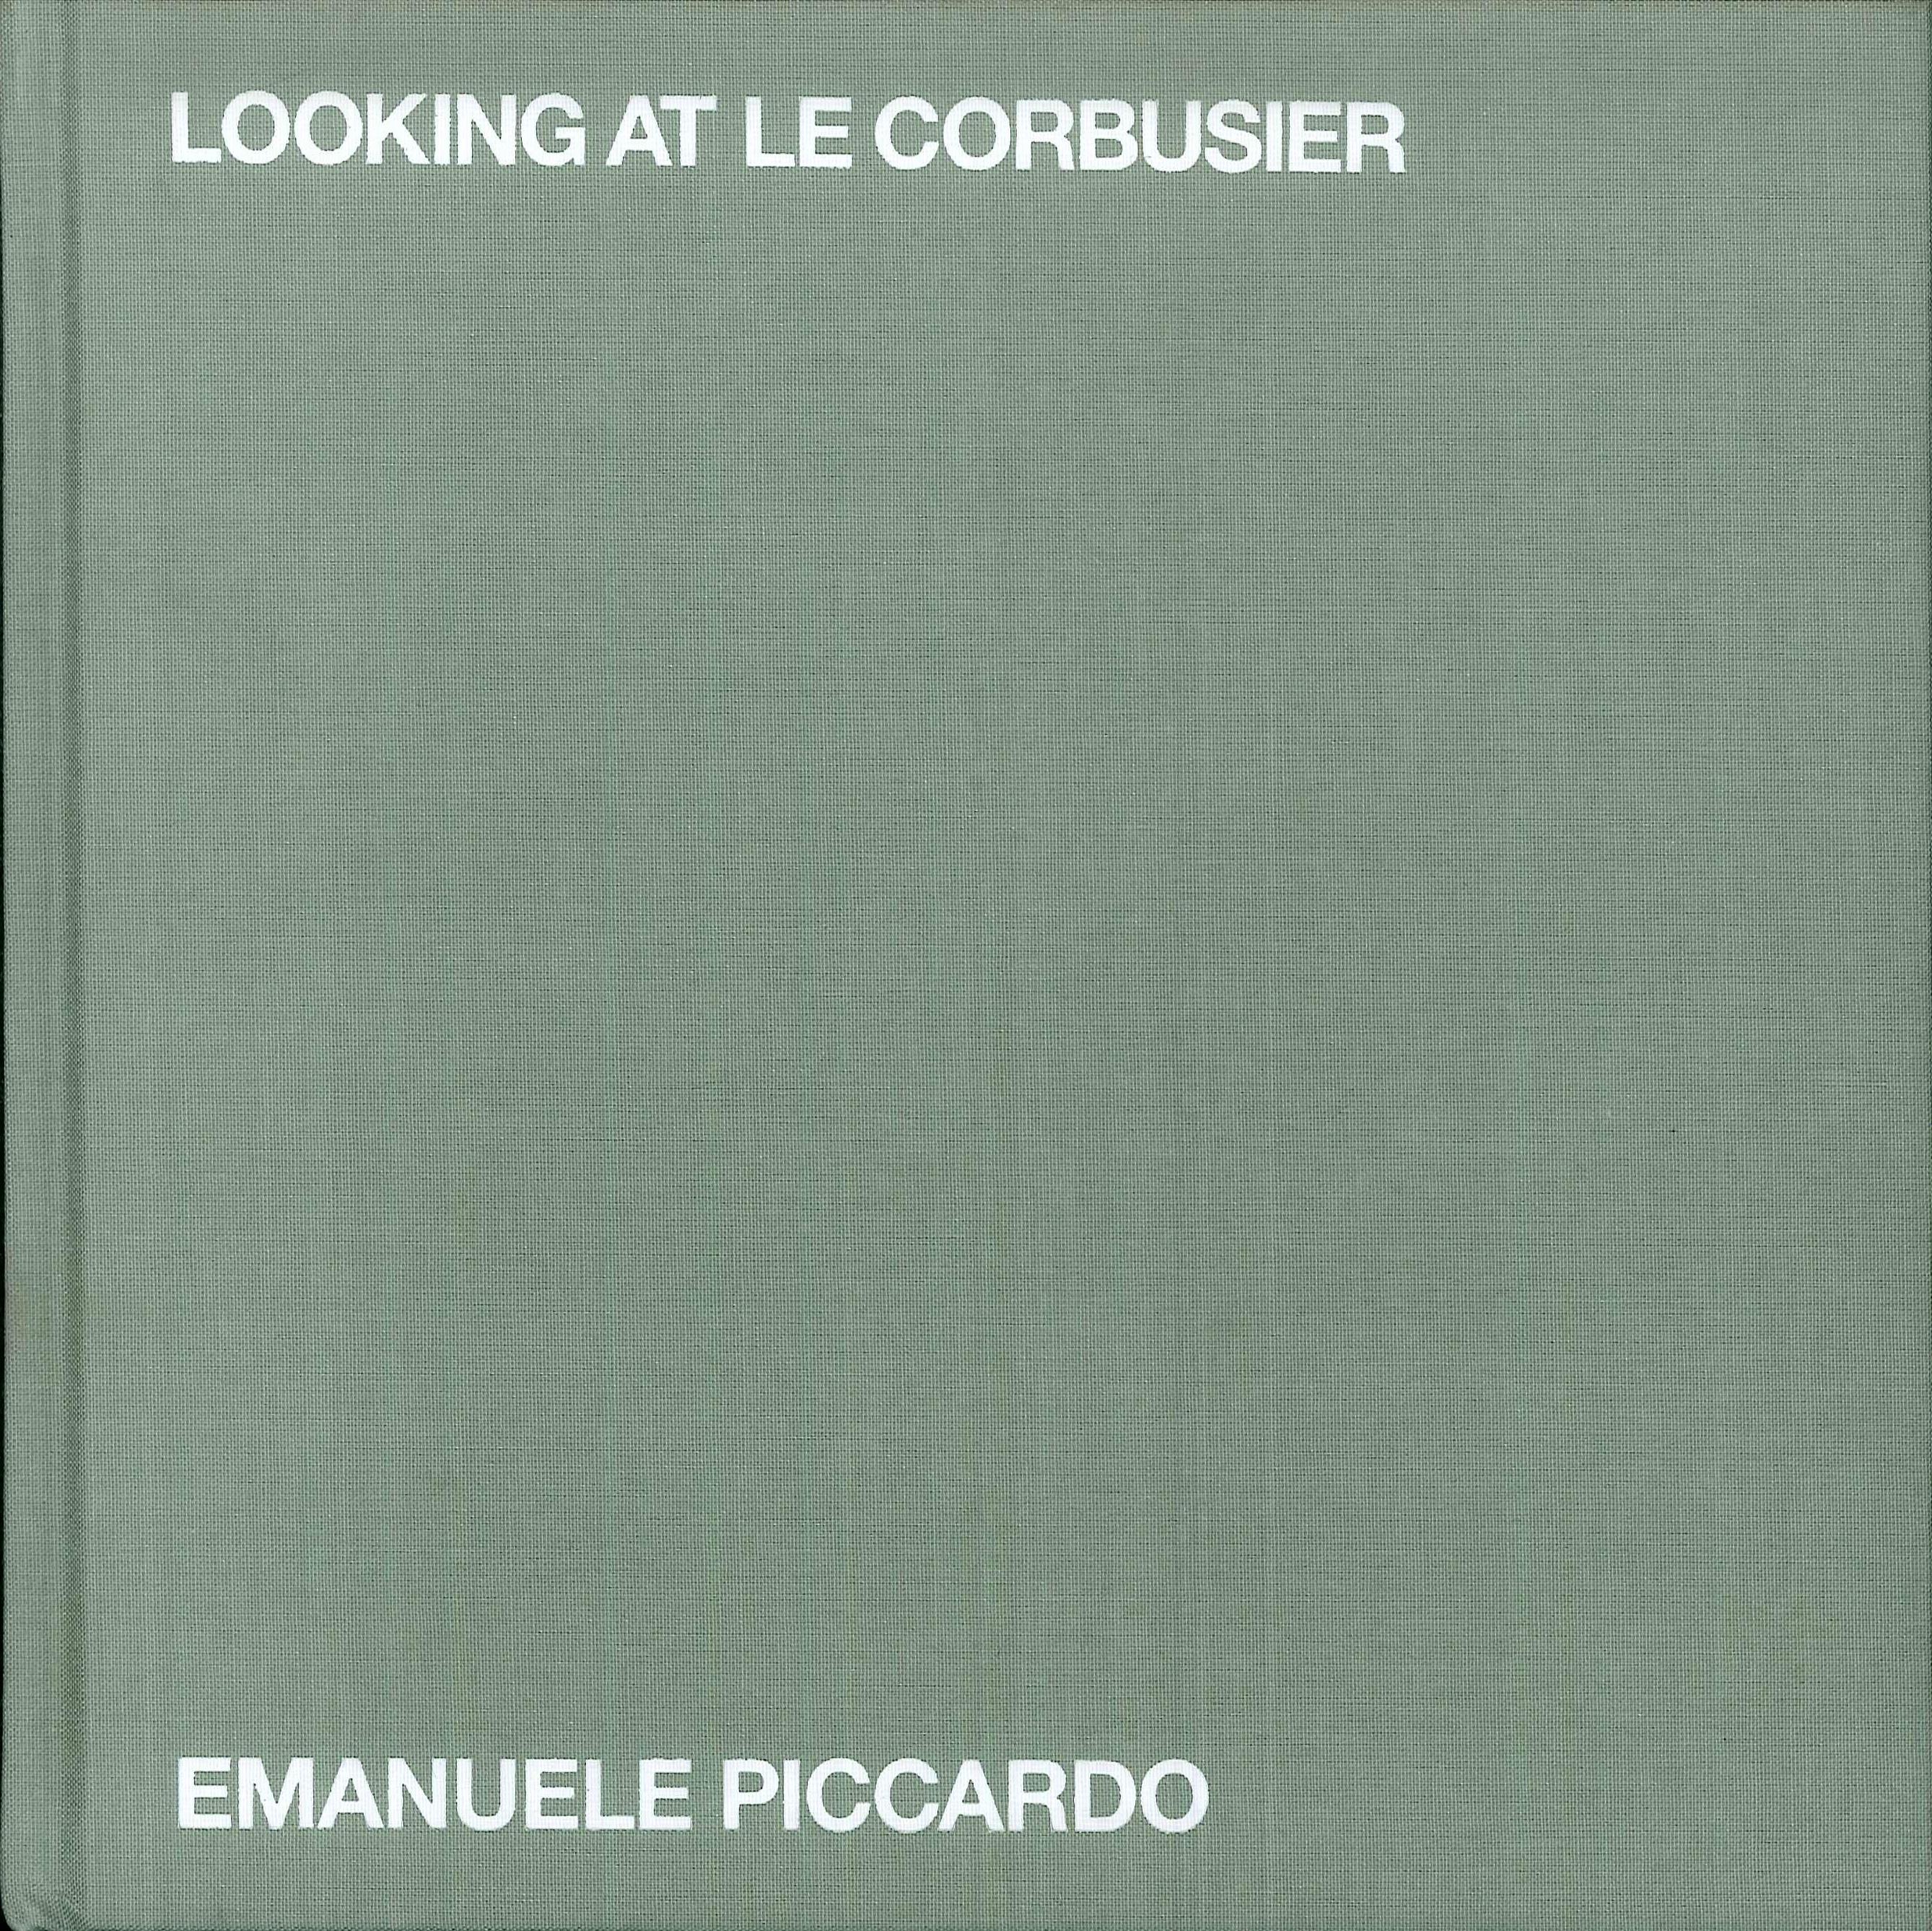 Looking at Le Corbusier.